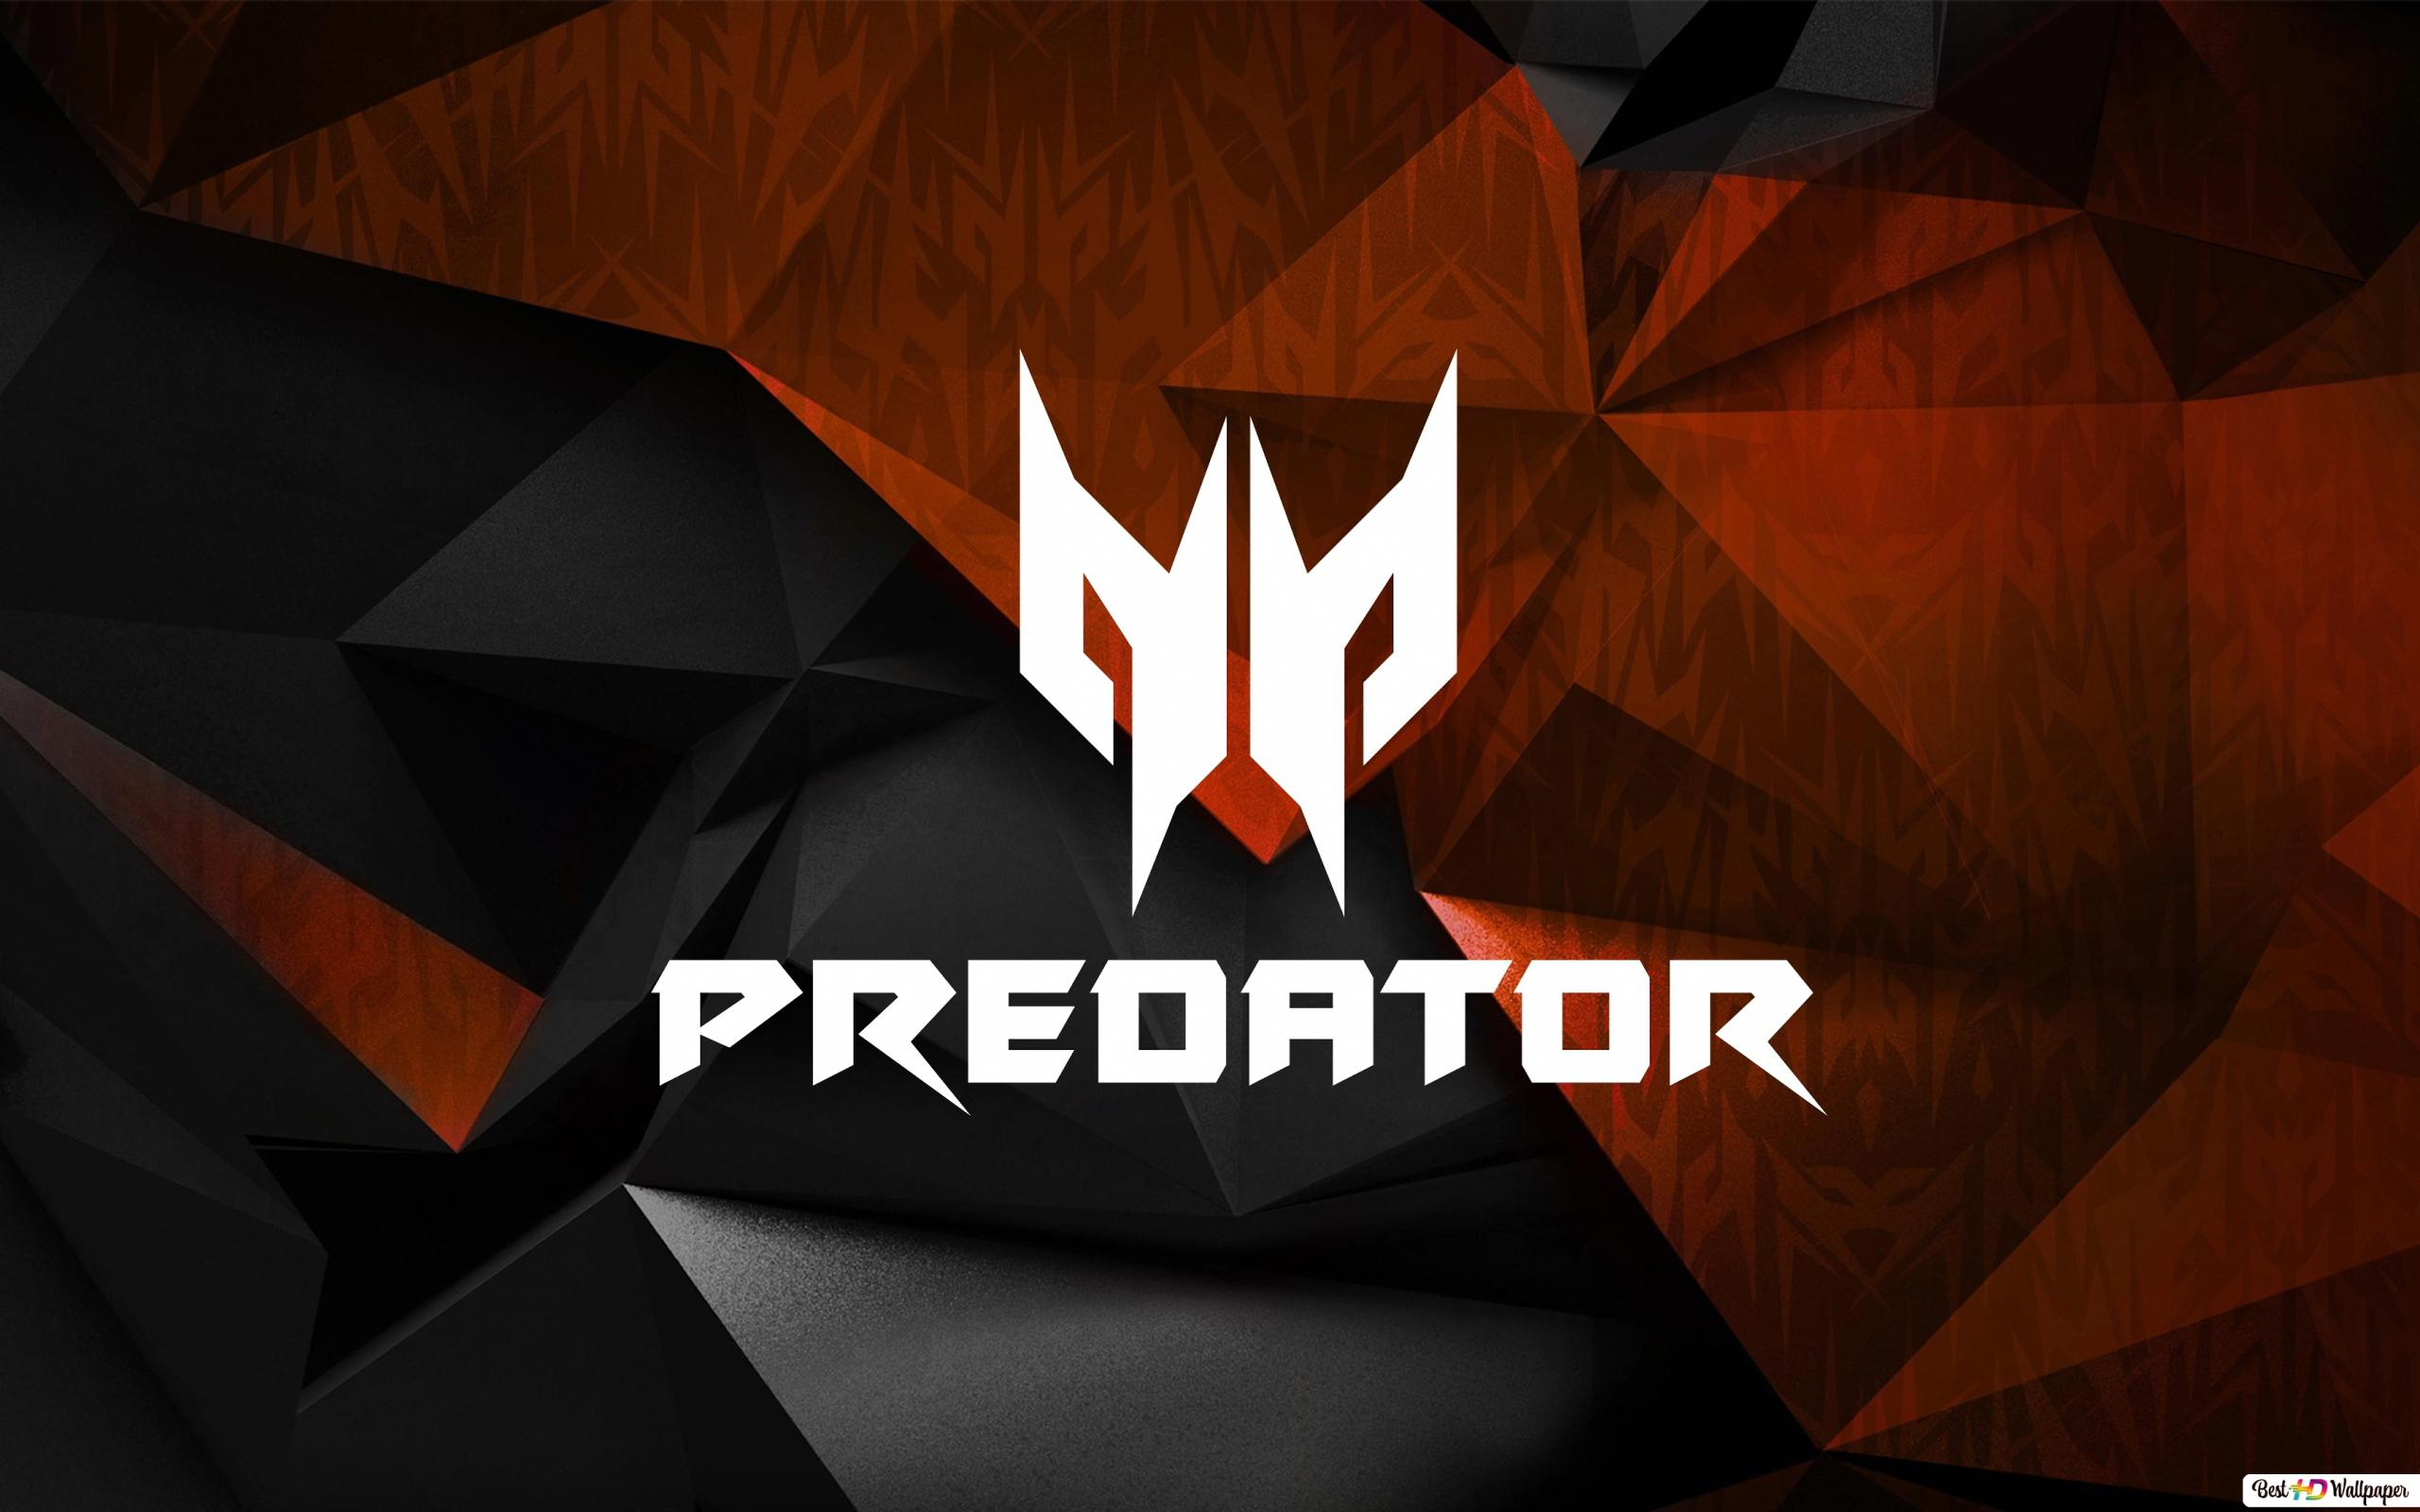 Acer Predator LOGO HD wallpaper download